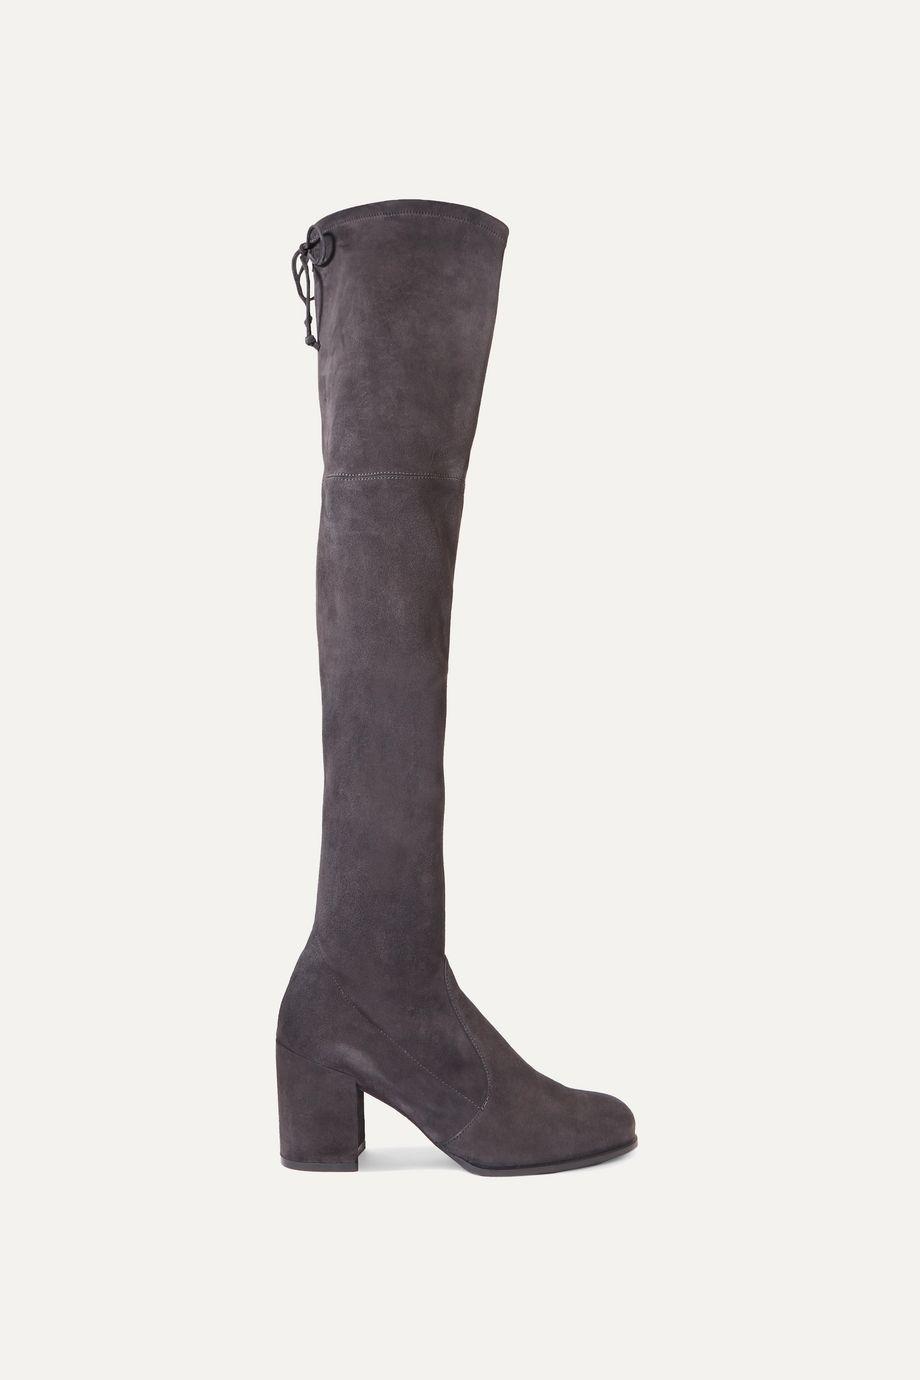 Stuart Weitzman Tieland stretch-suede over-the-knee boots